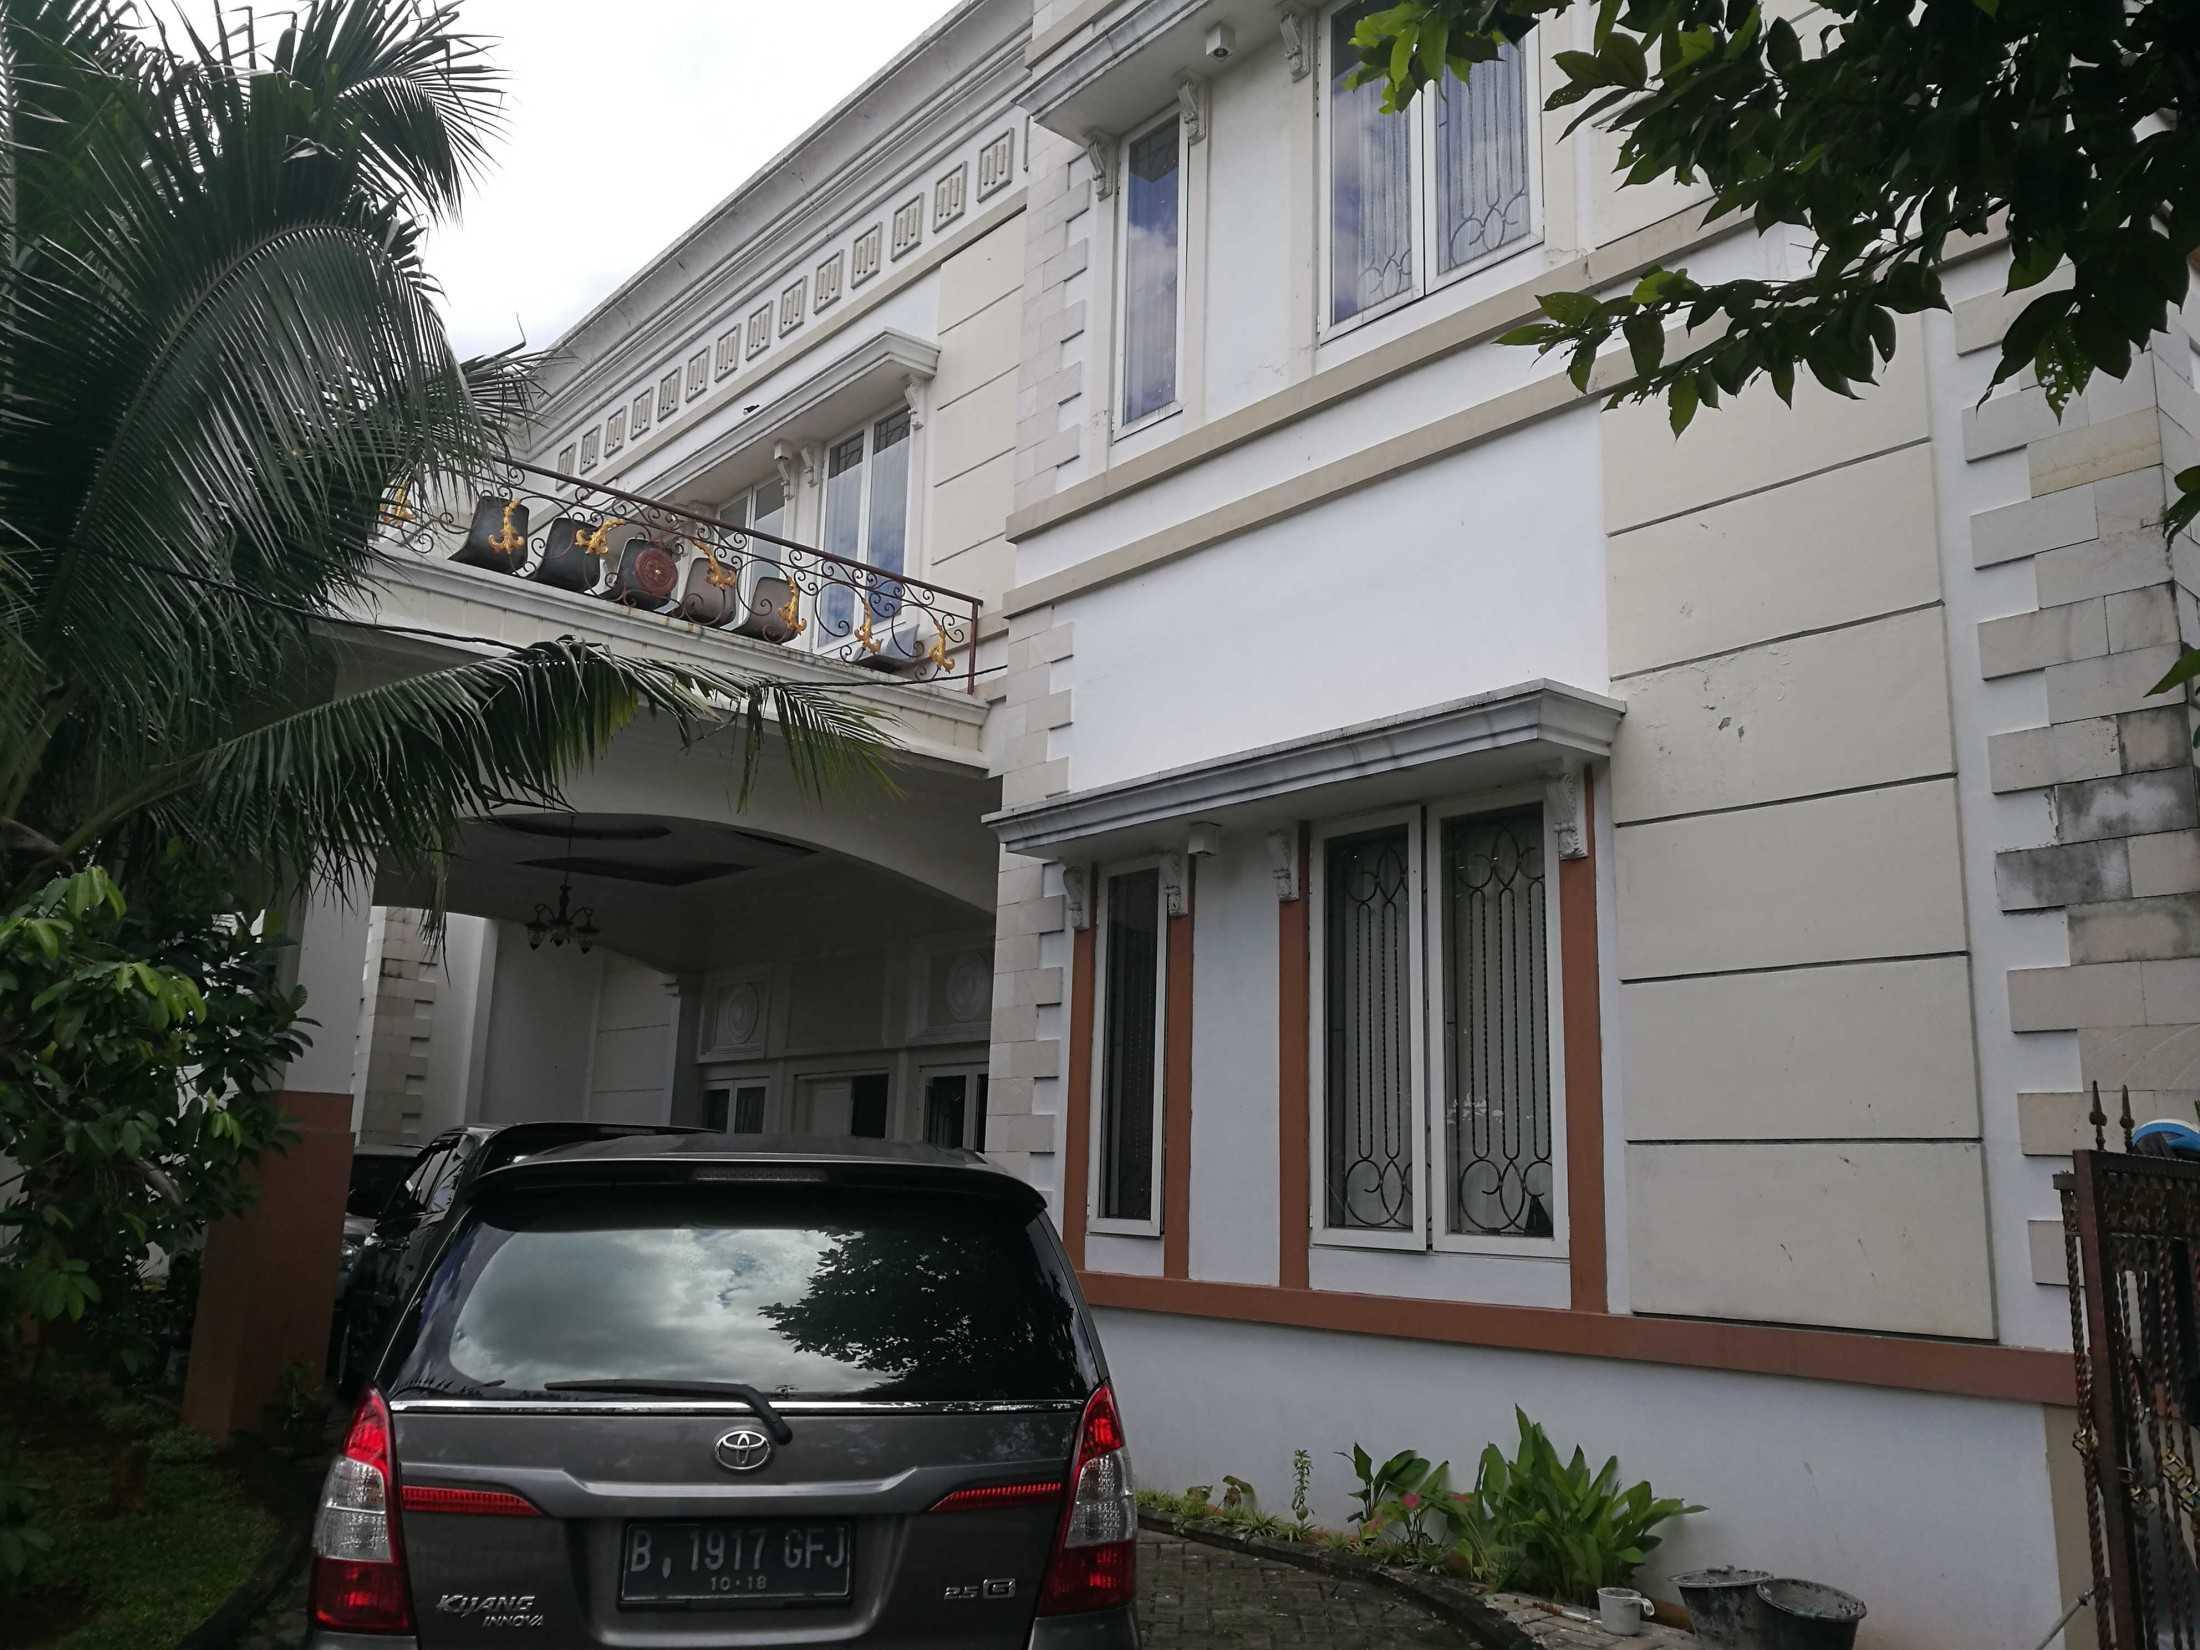 Rumah Berkat Sejahtera Exclusive House & Dormitory Lippo Karawaci, Binong, Kec. Curug, Tangerang, Banten, Indonesia Lippo Karawaci, Binong, Kec. Curug, Tangerang, Banten, Indonesia Rumah-Berkat-Sejahtera-Exclusive-House-Dormitory  99639